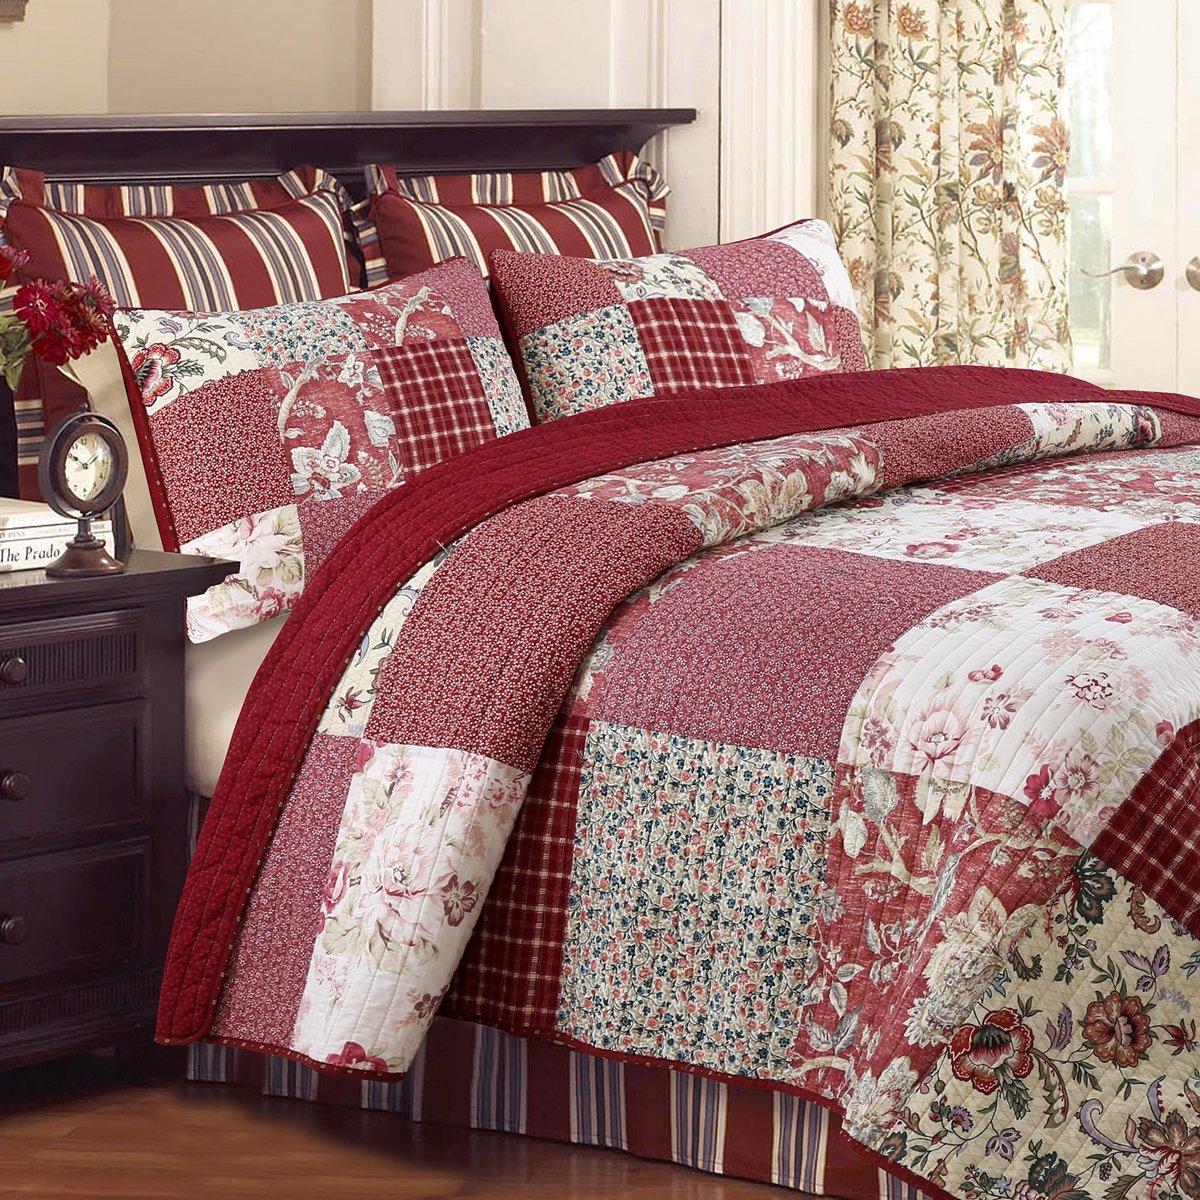 Bedspread Pink Rose Garden 100/% Cotton Quilt Set Coverlet